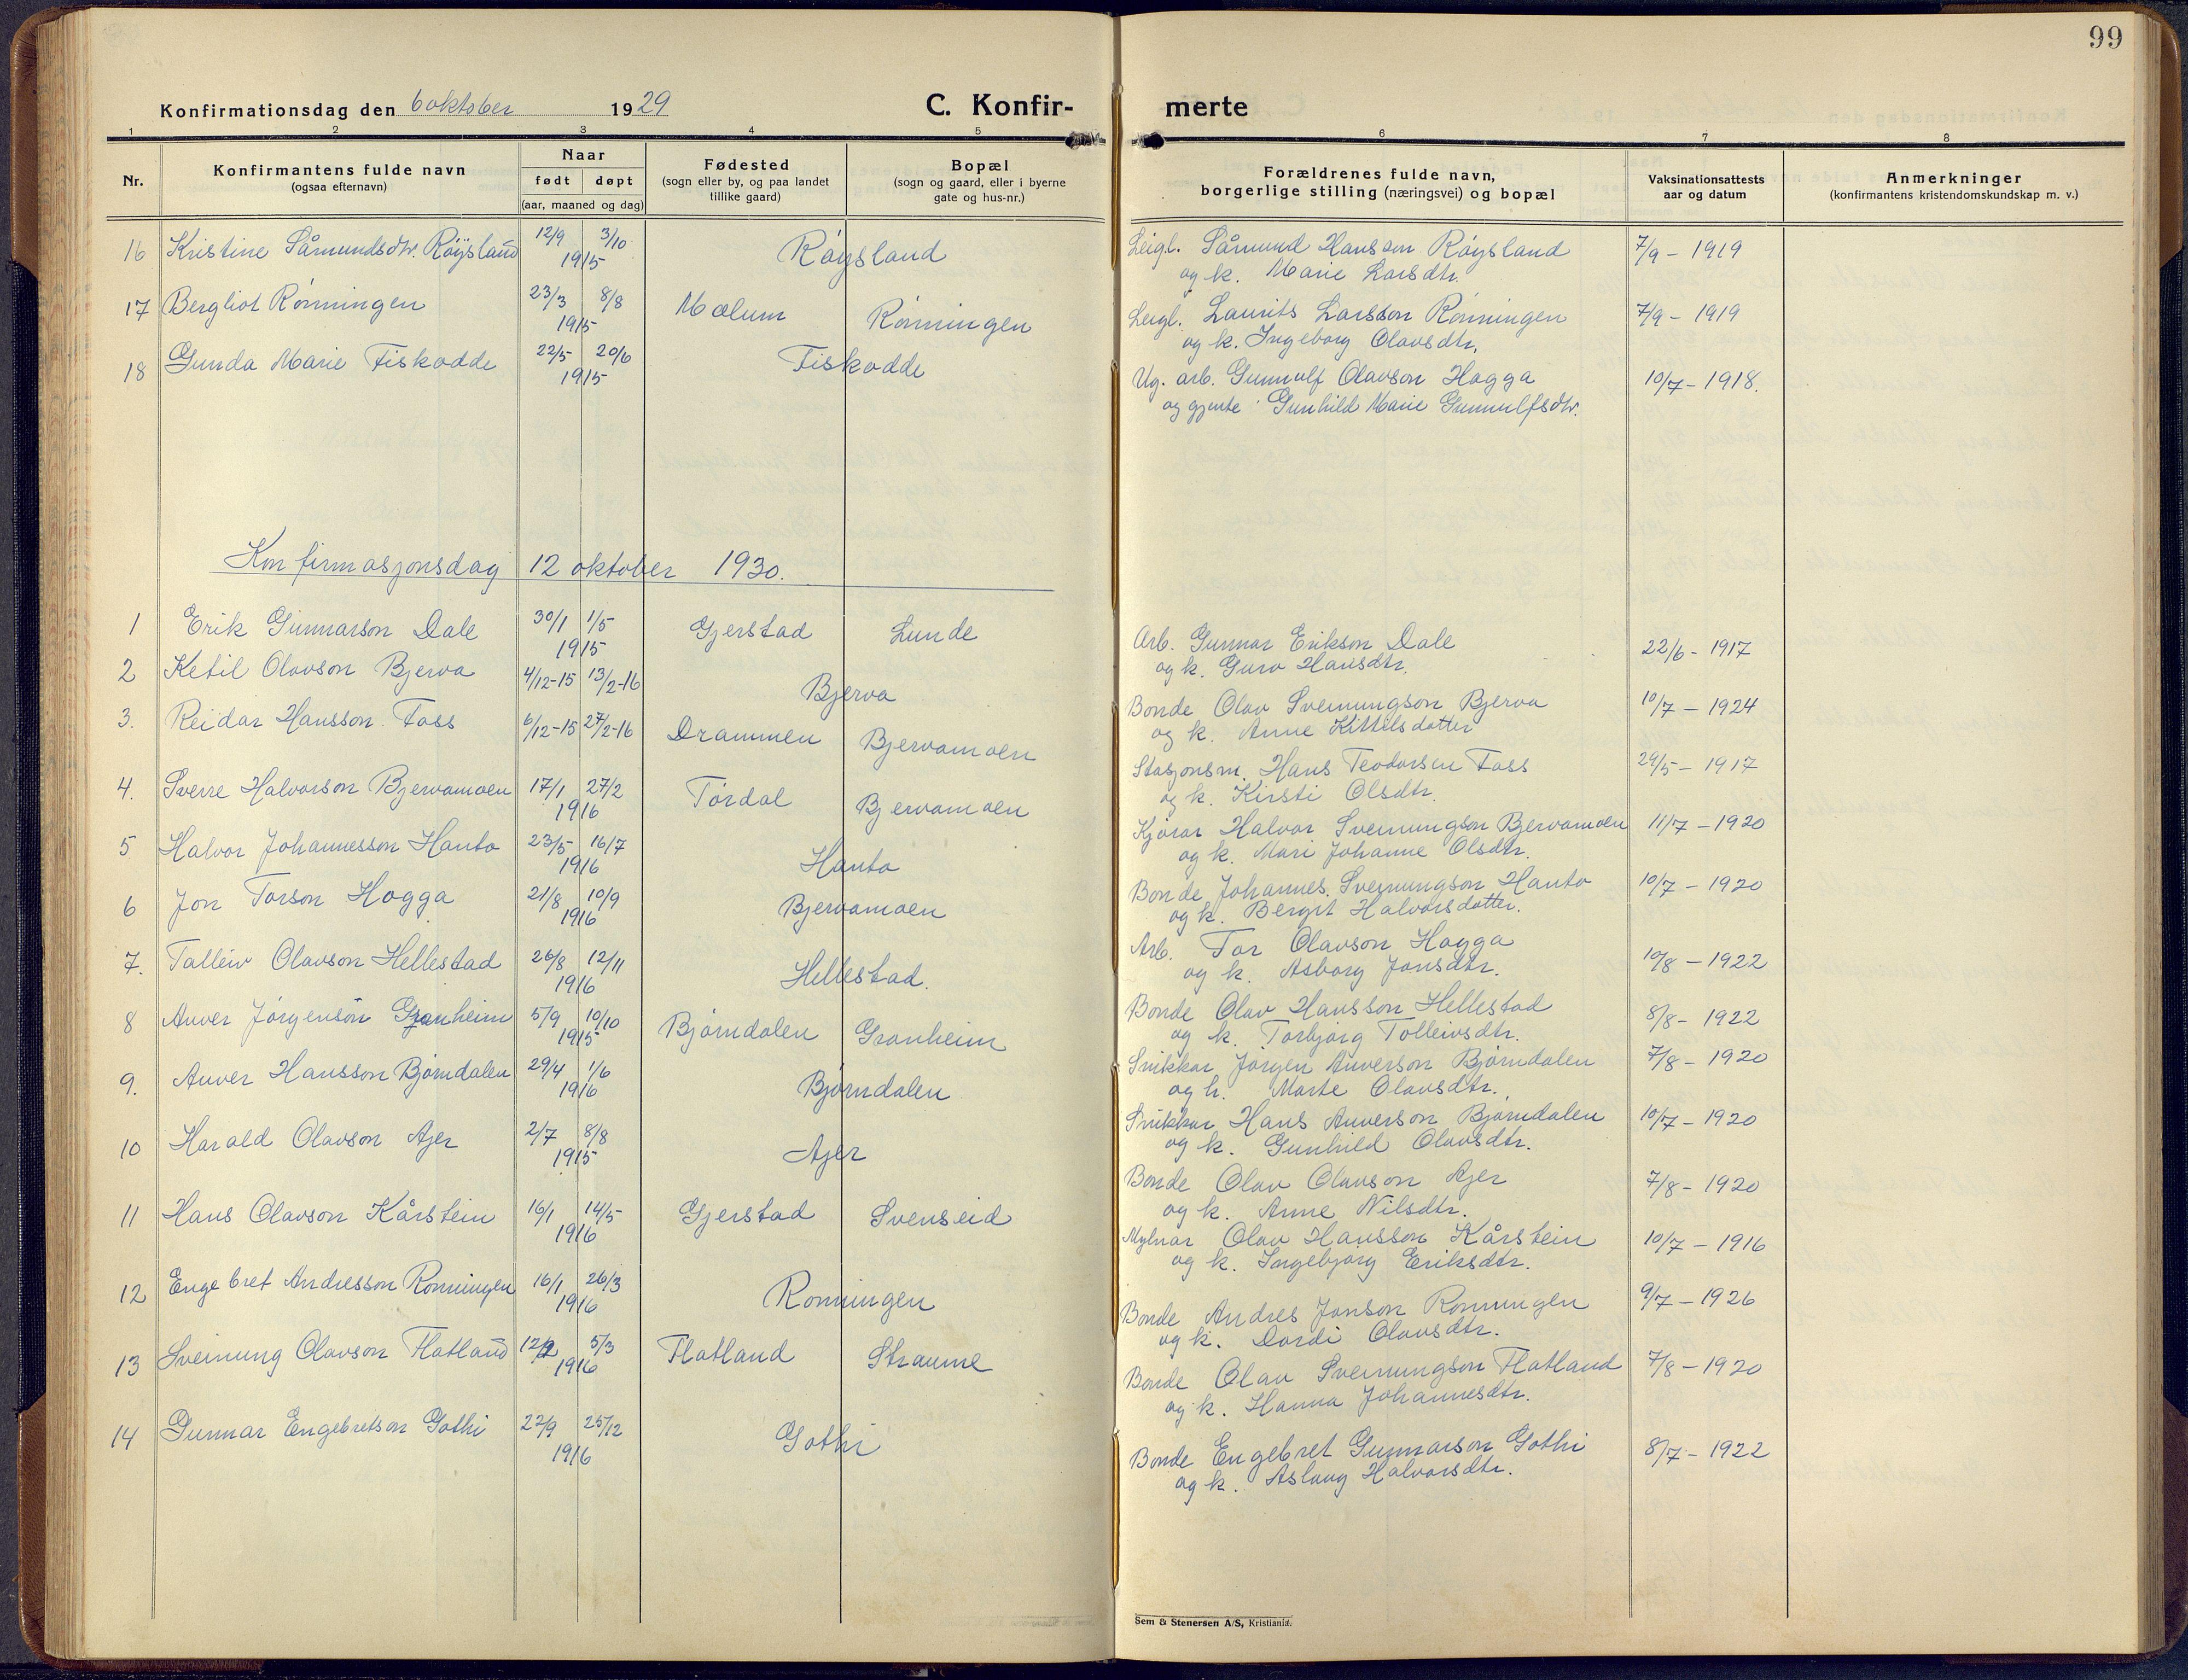 SAKO, Lunde kirkebøker, F/Fa/L0006: Ministerialbok nr. I 6, 1922-1940, s. 99